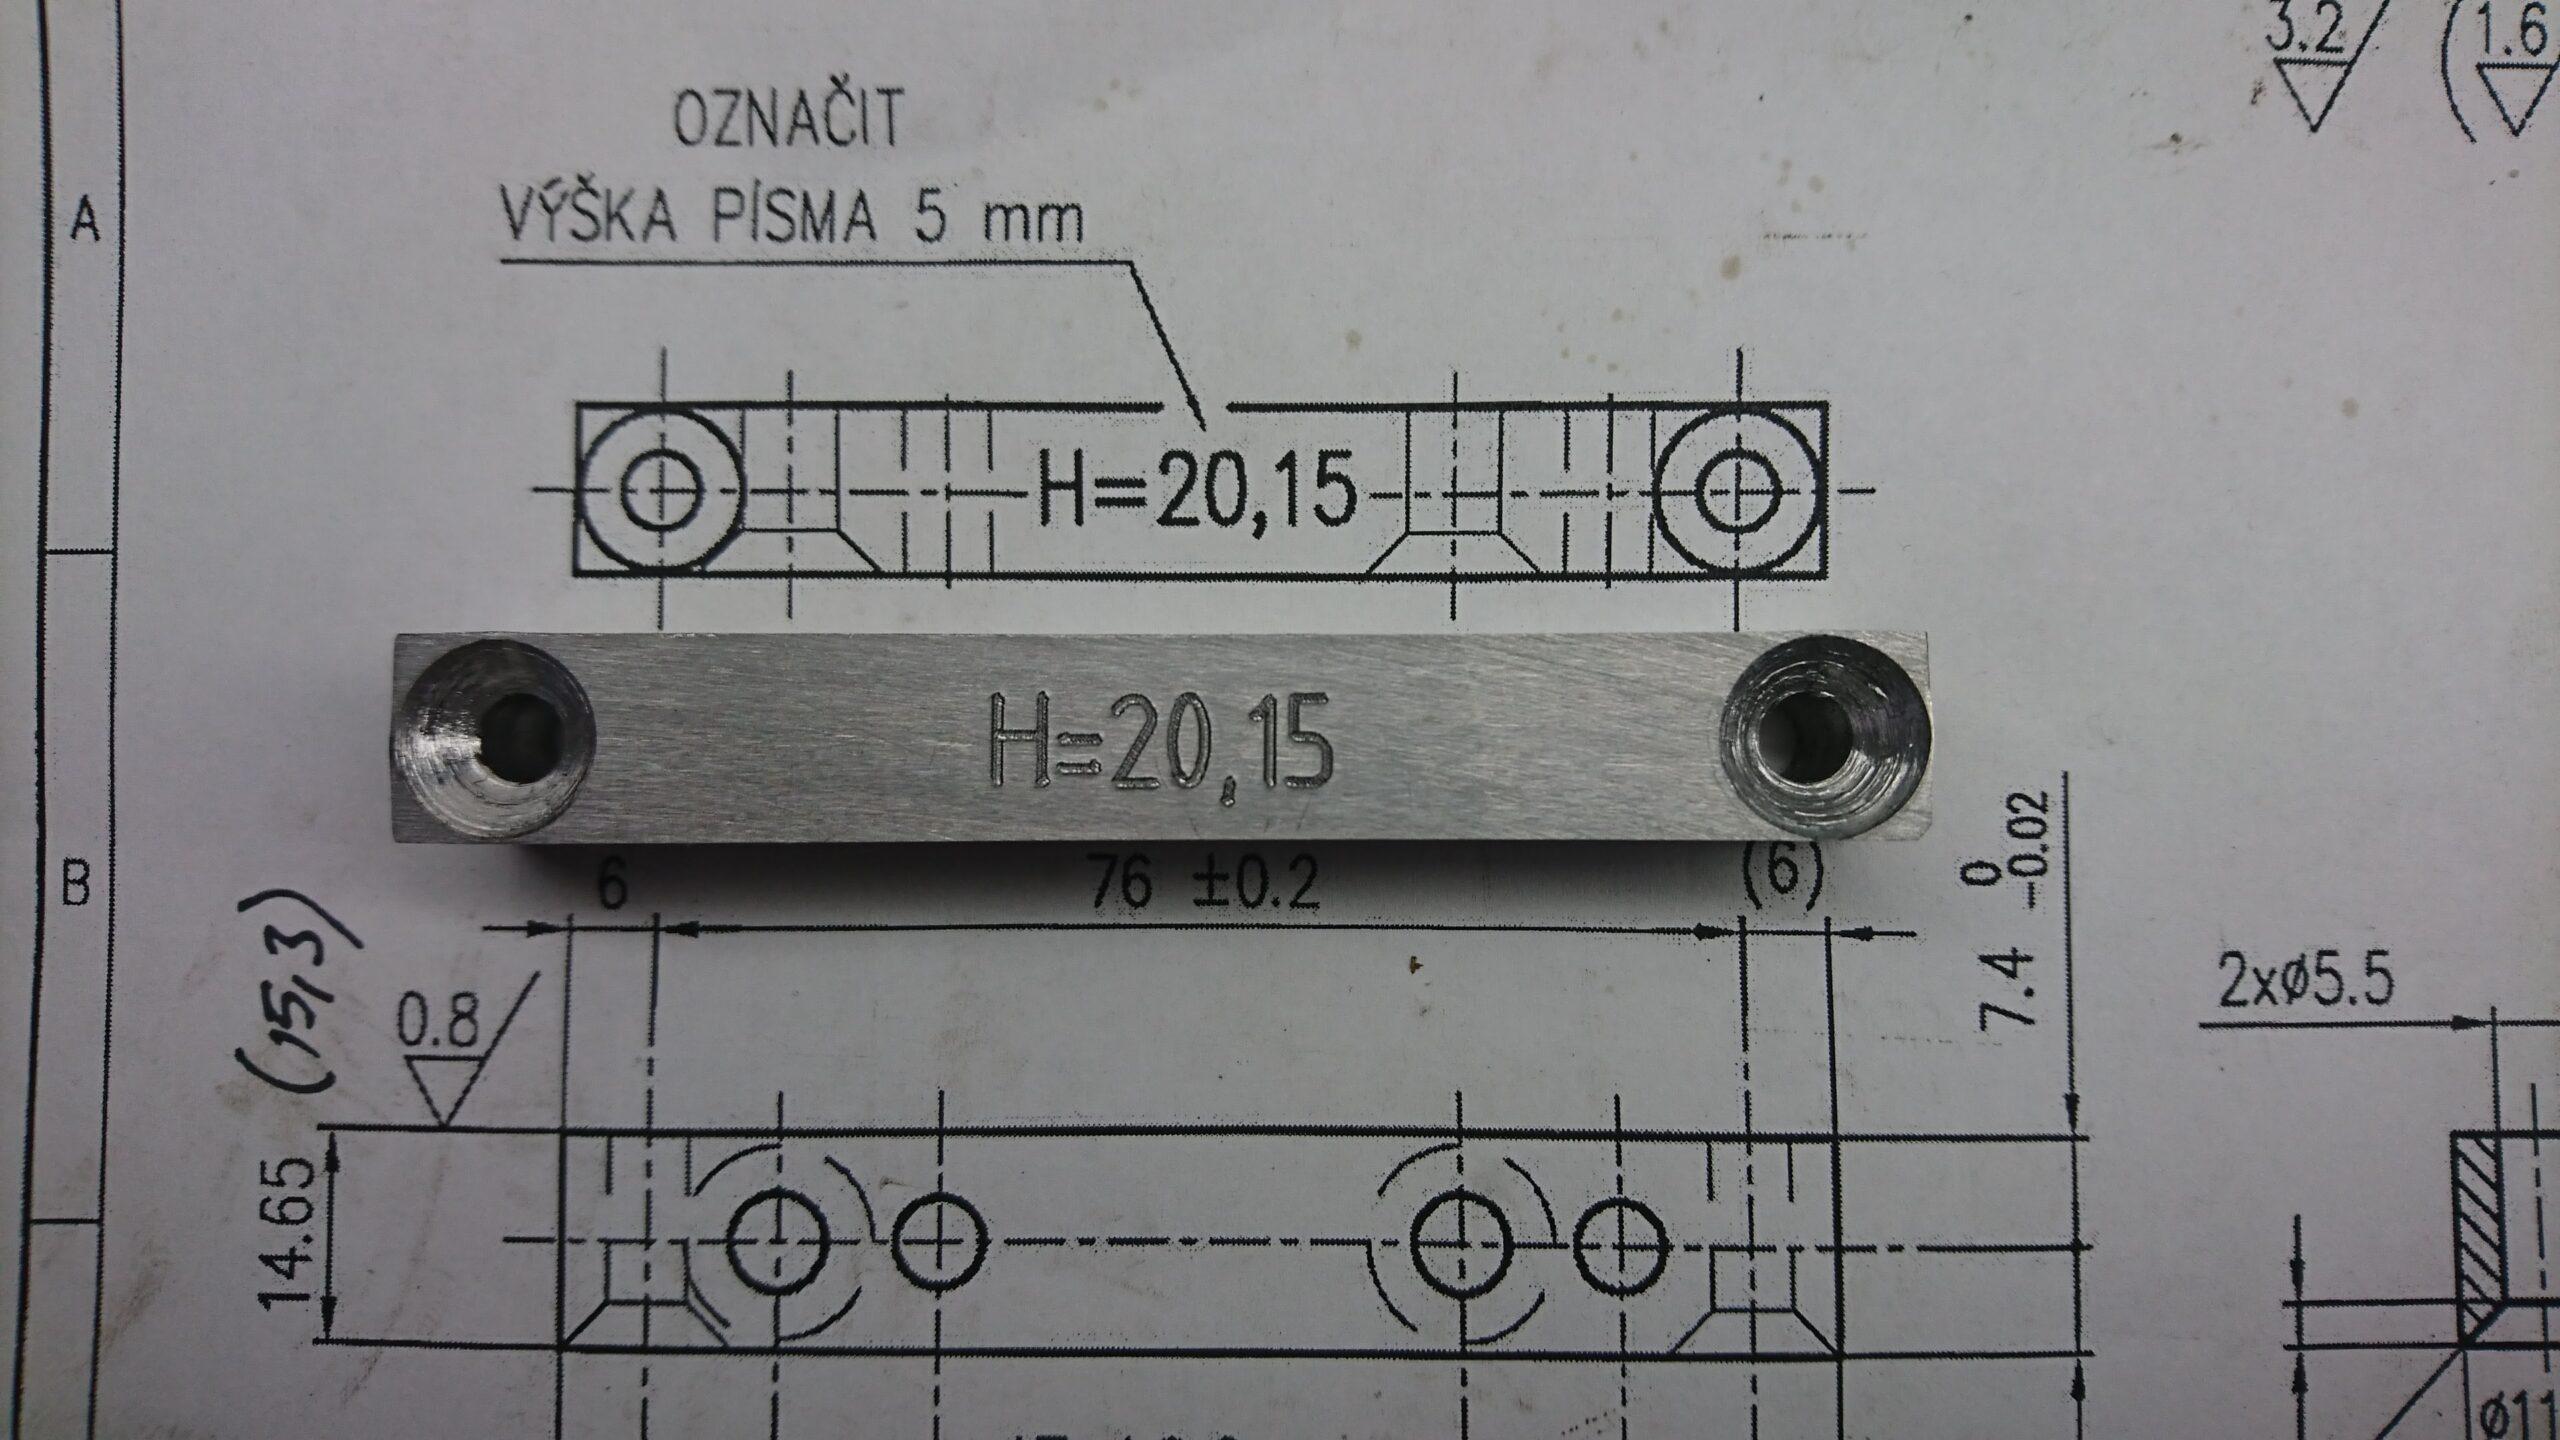 DSC_0806-1-1-scaled.jpg